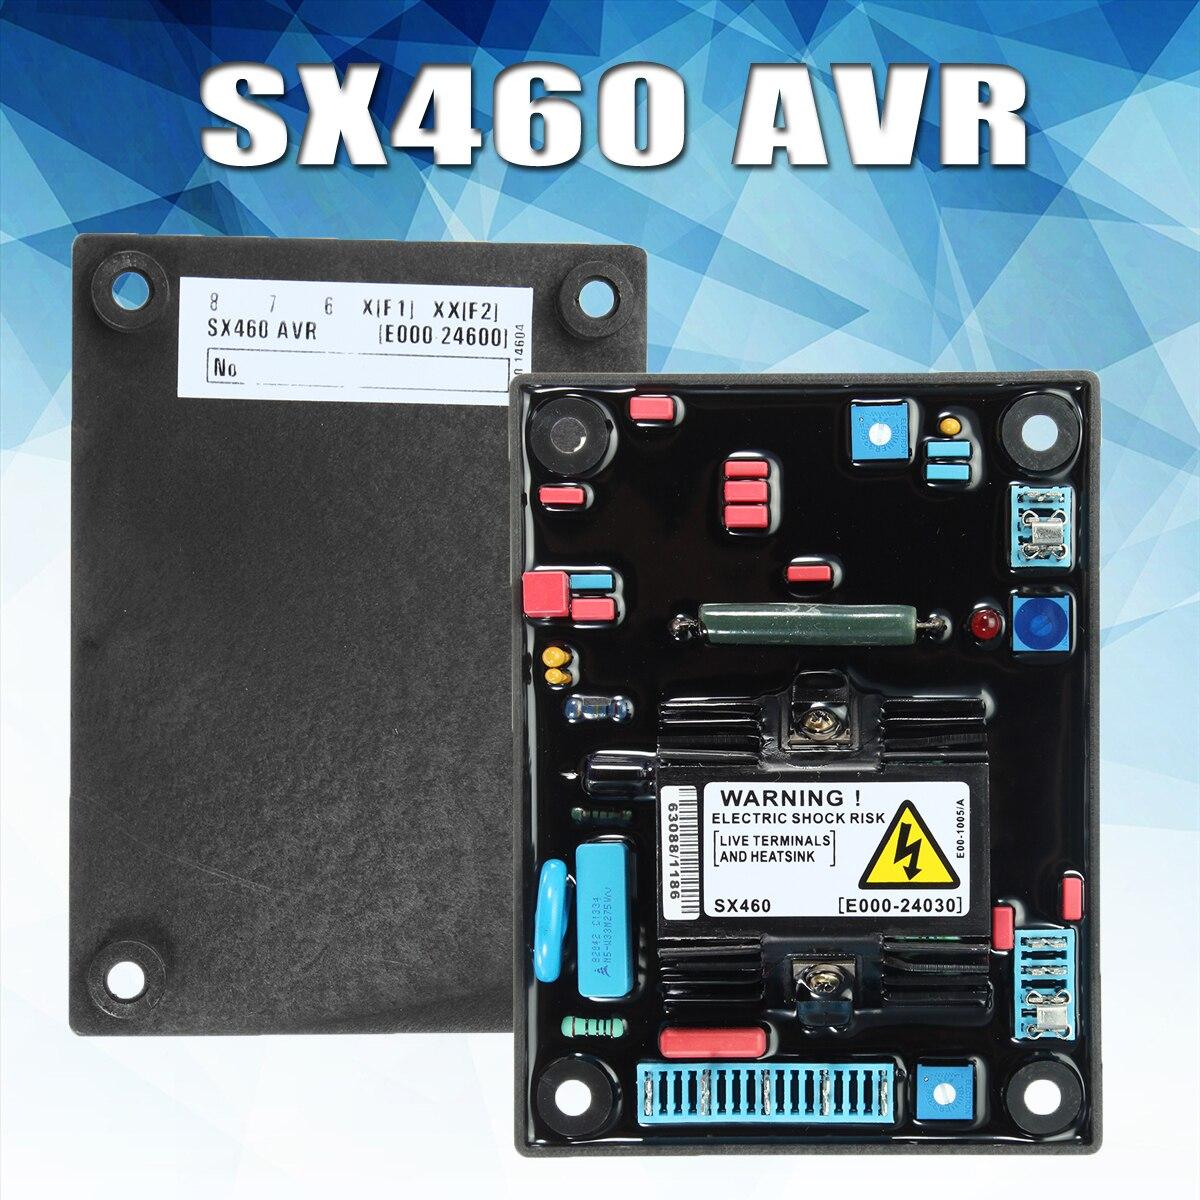 Red rubber SX460 AVR Automatic Voltage Regulator For Stamford Diese l Generator stamford generator avr sx460